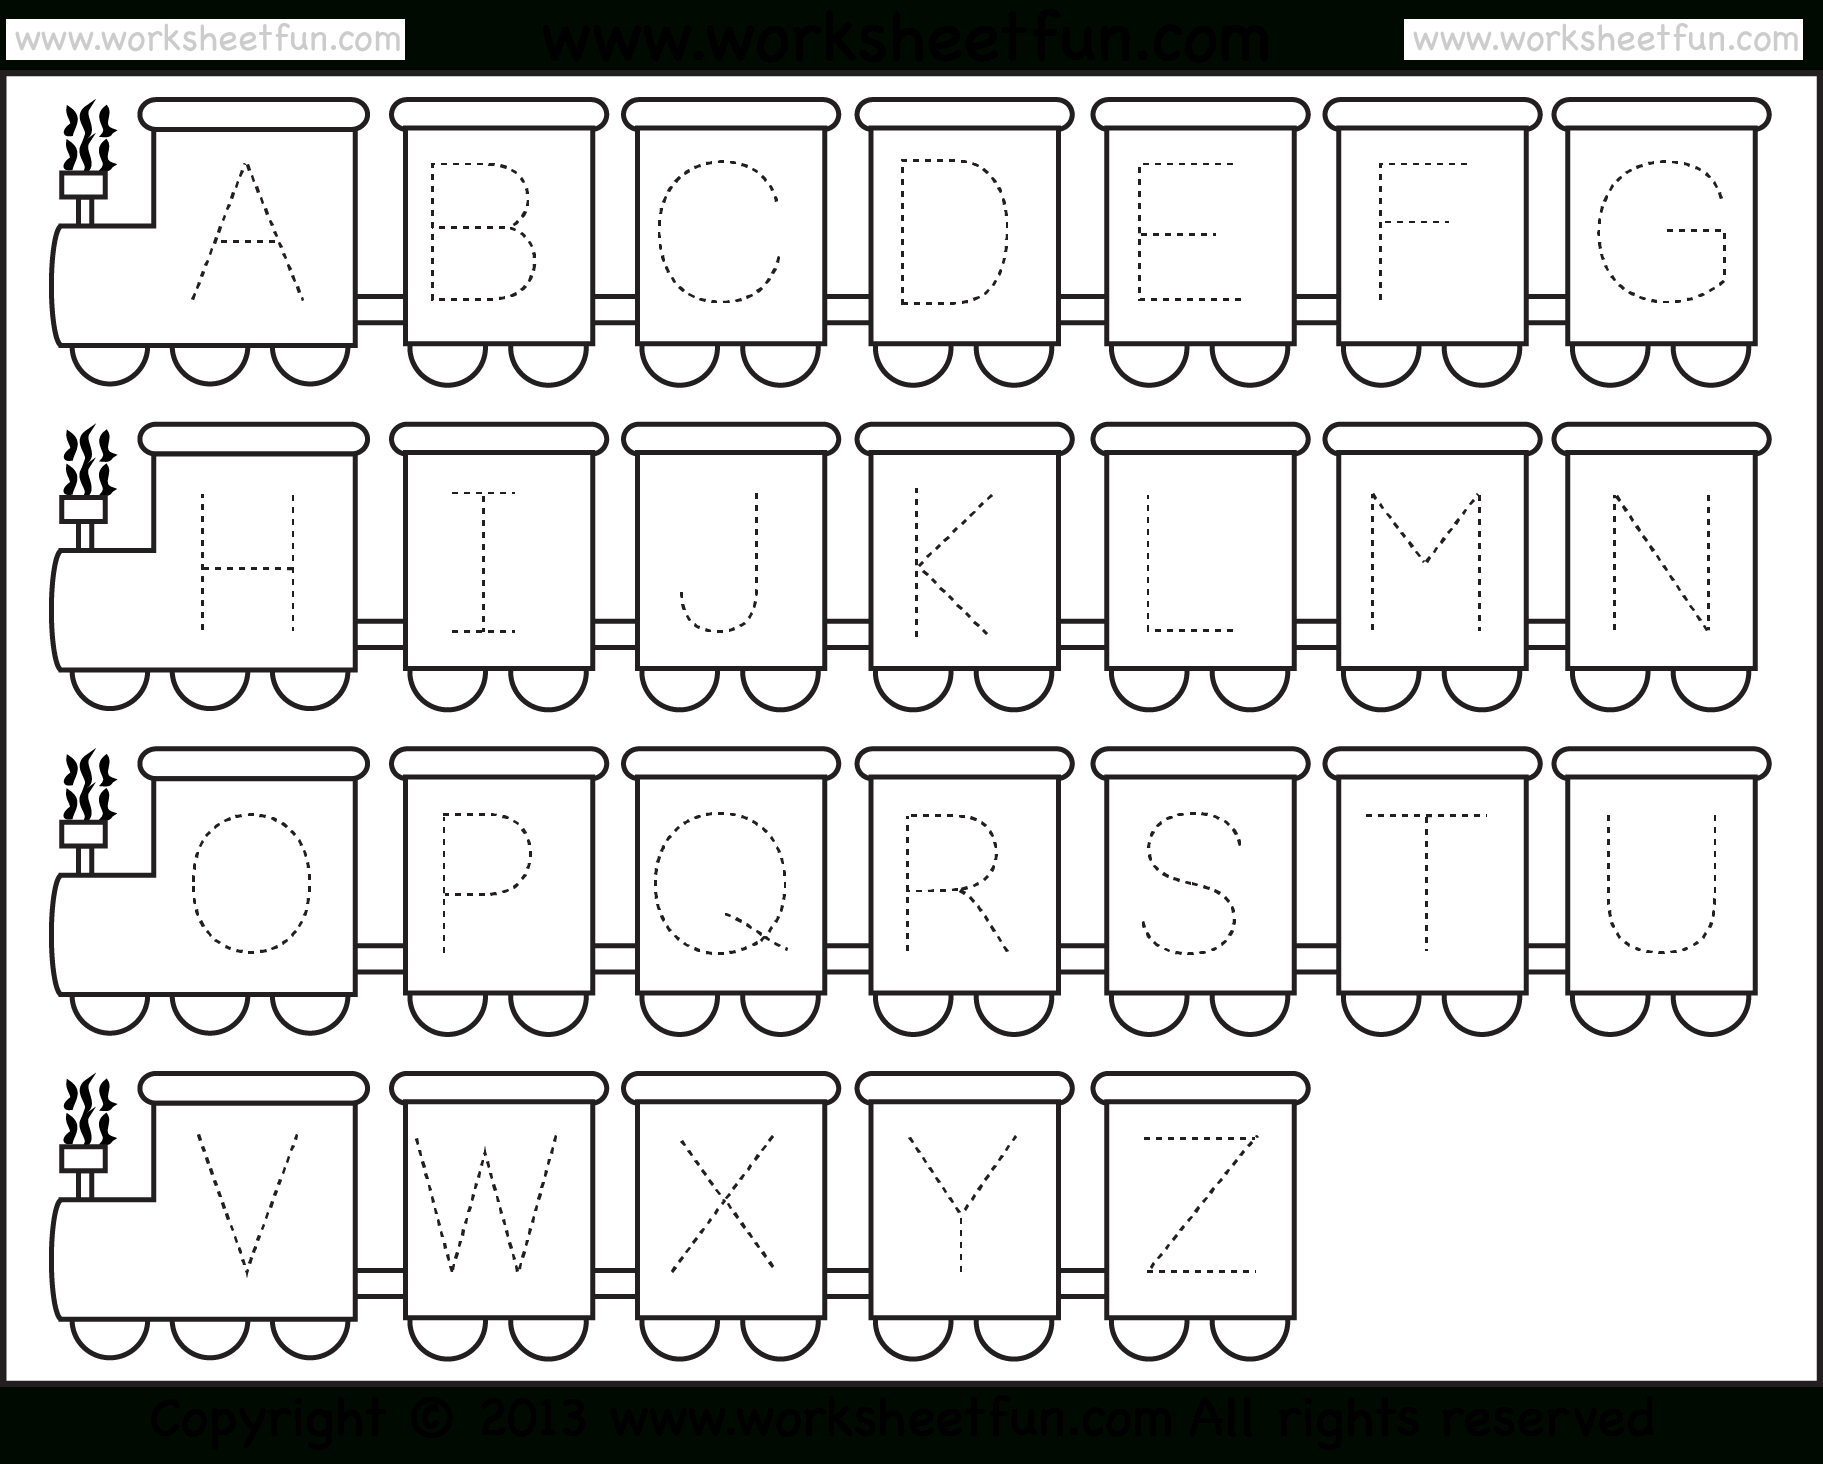 Letter Tracing Worksheet – Train Theme / Free Printable throughout Alphabet Worksheets For Kindergarten Pdf